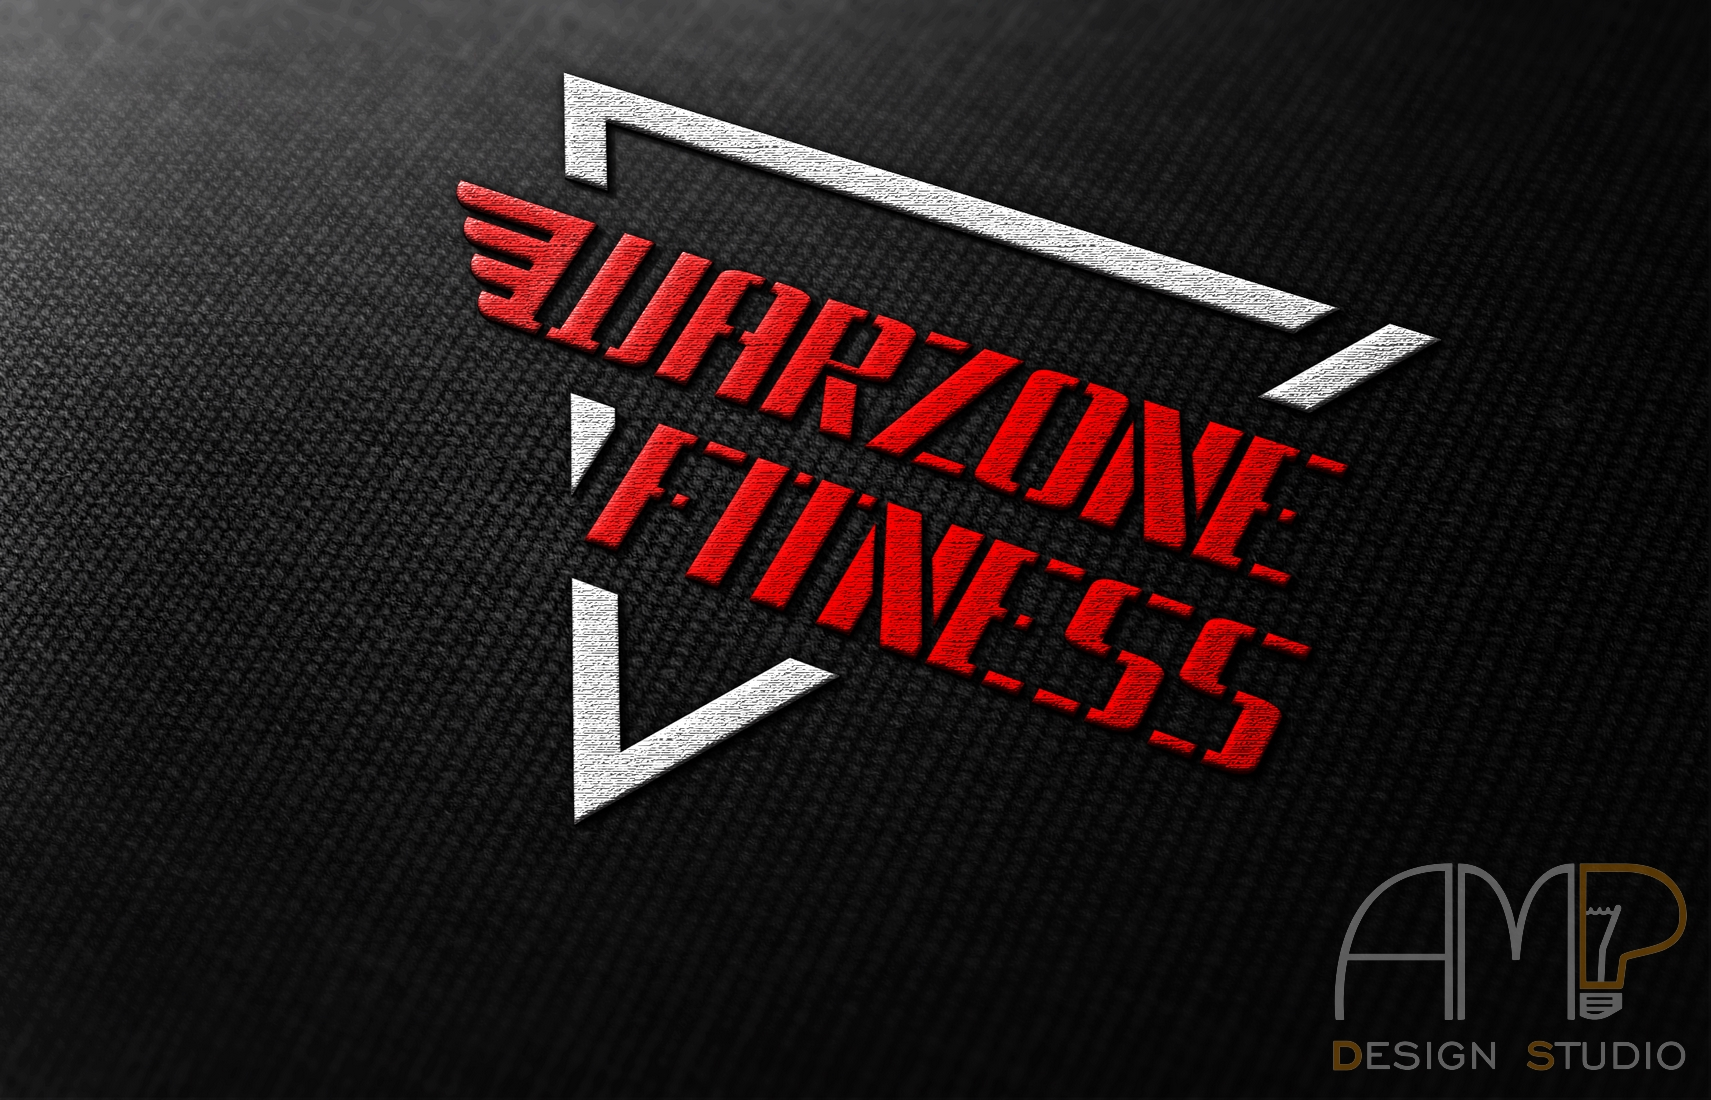 WarZone logo 1